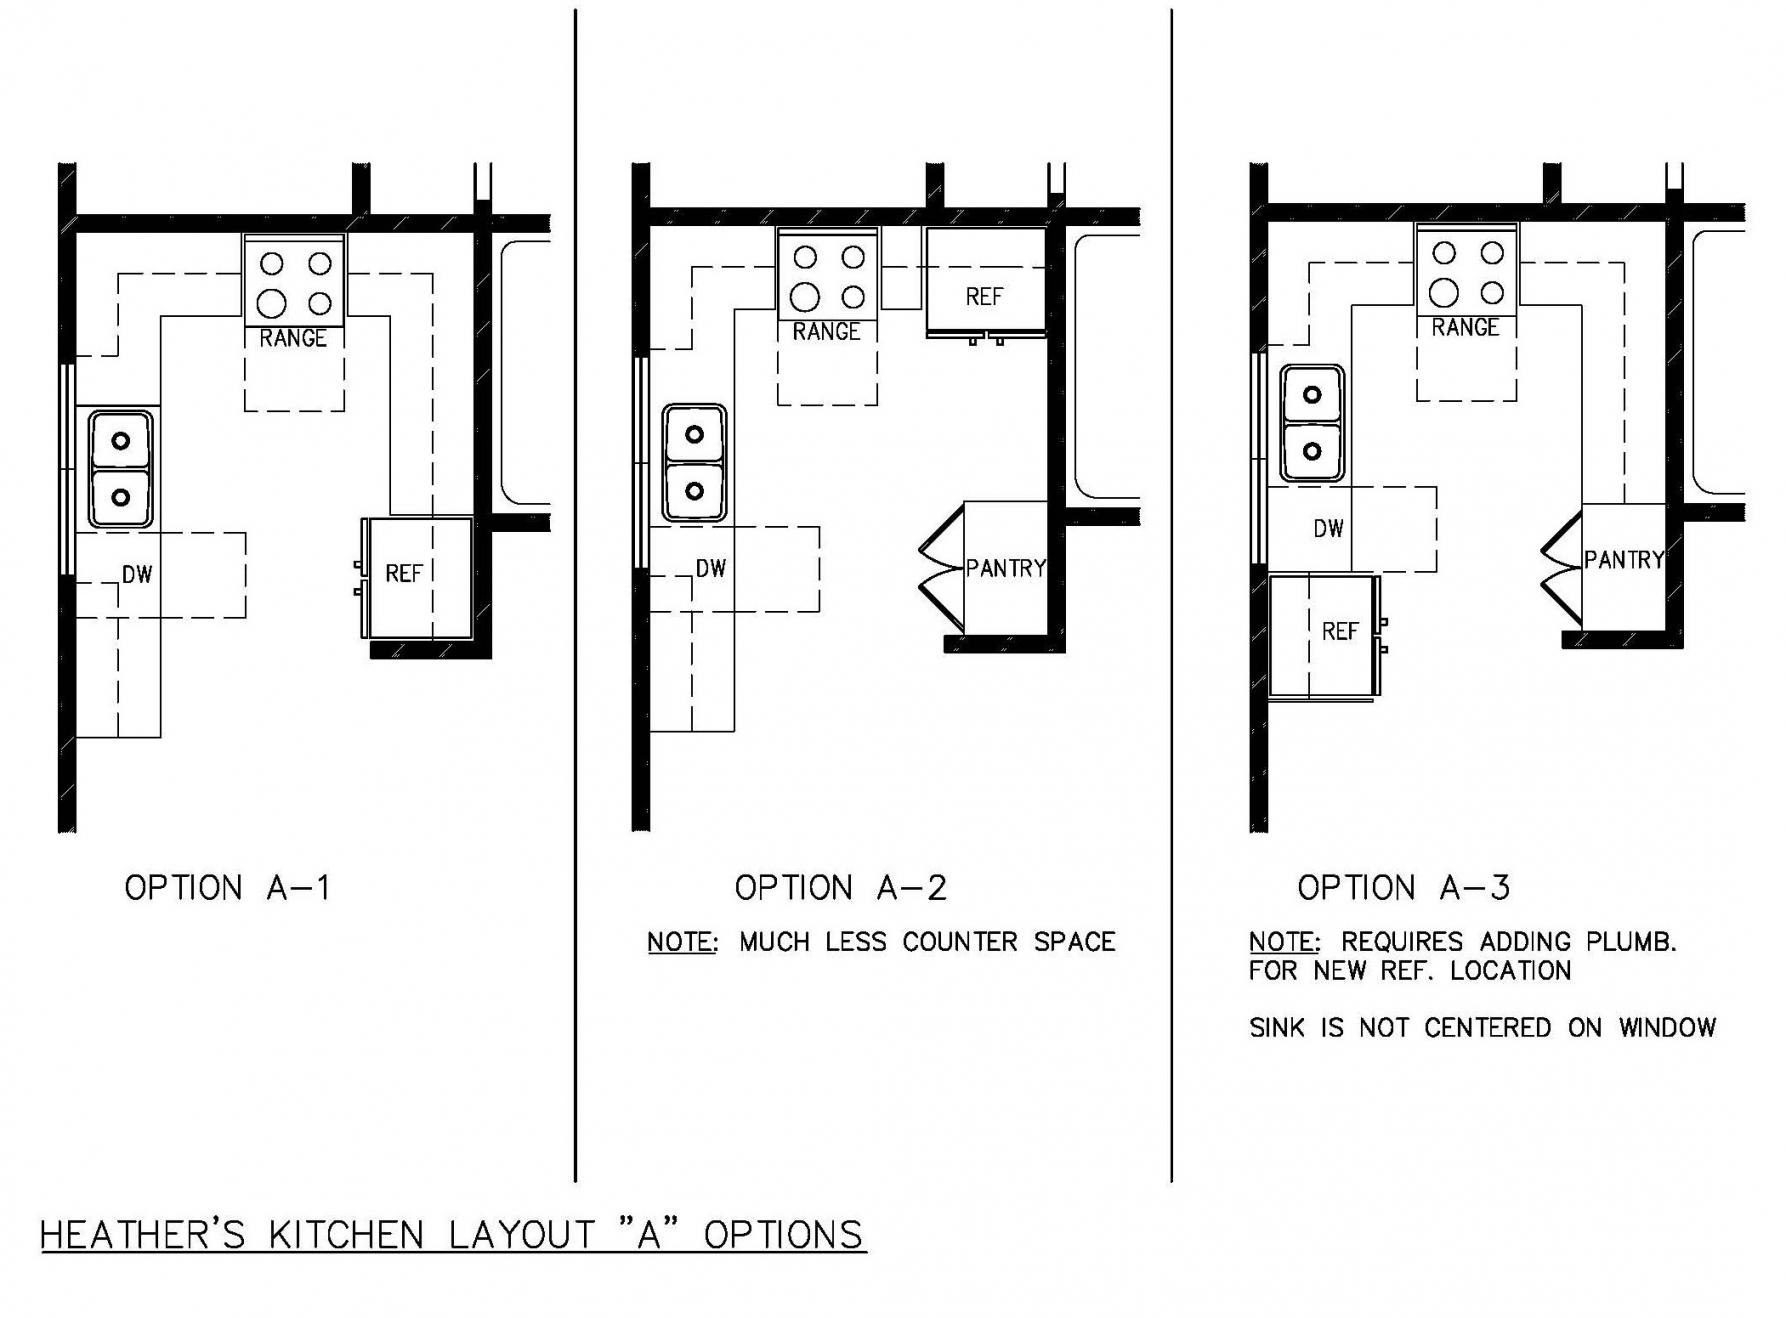 u shaped kitchen floor plans photo - 9